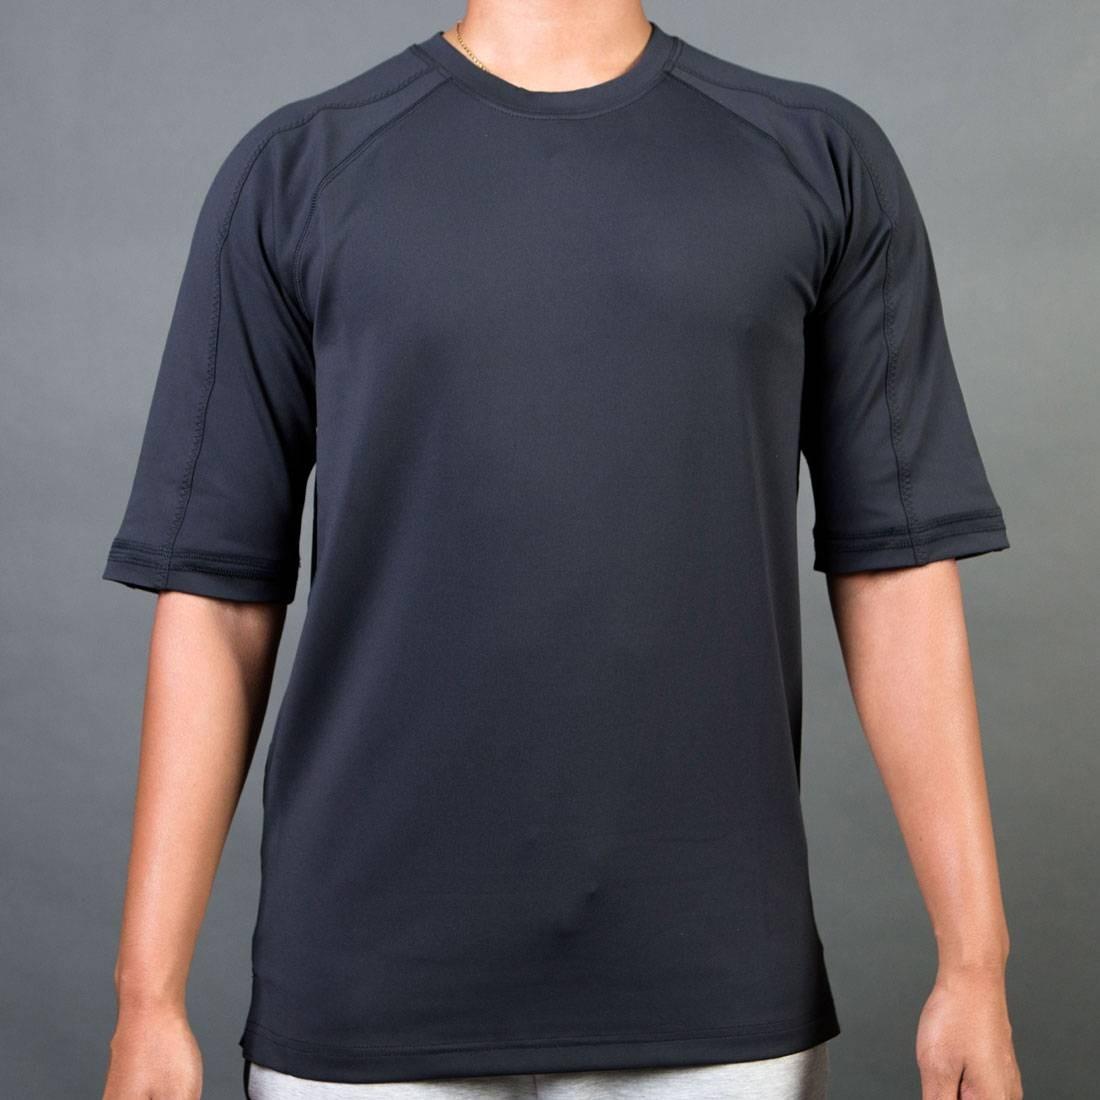 Adidas Consortium Day One Men No Stain Tee (black)